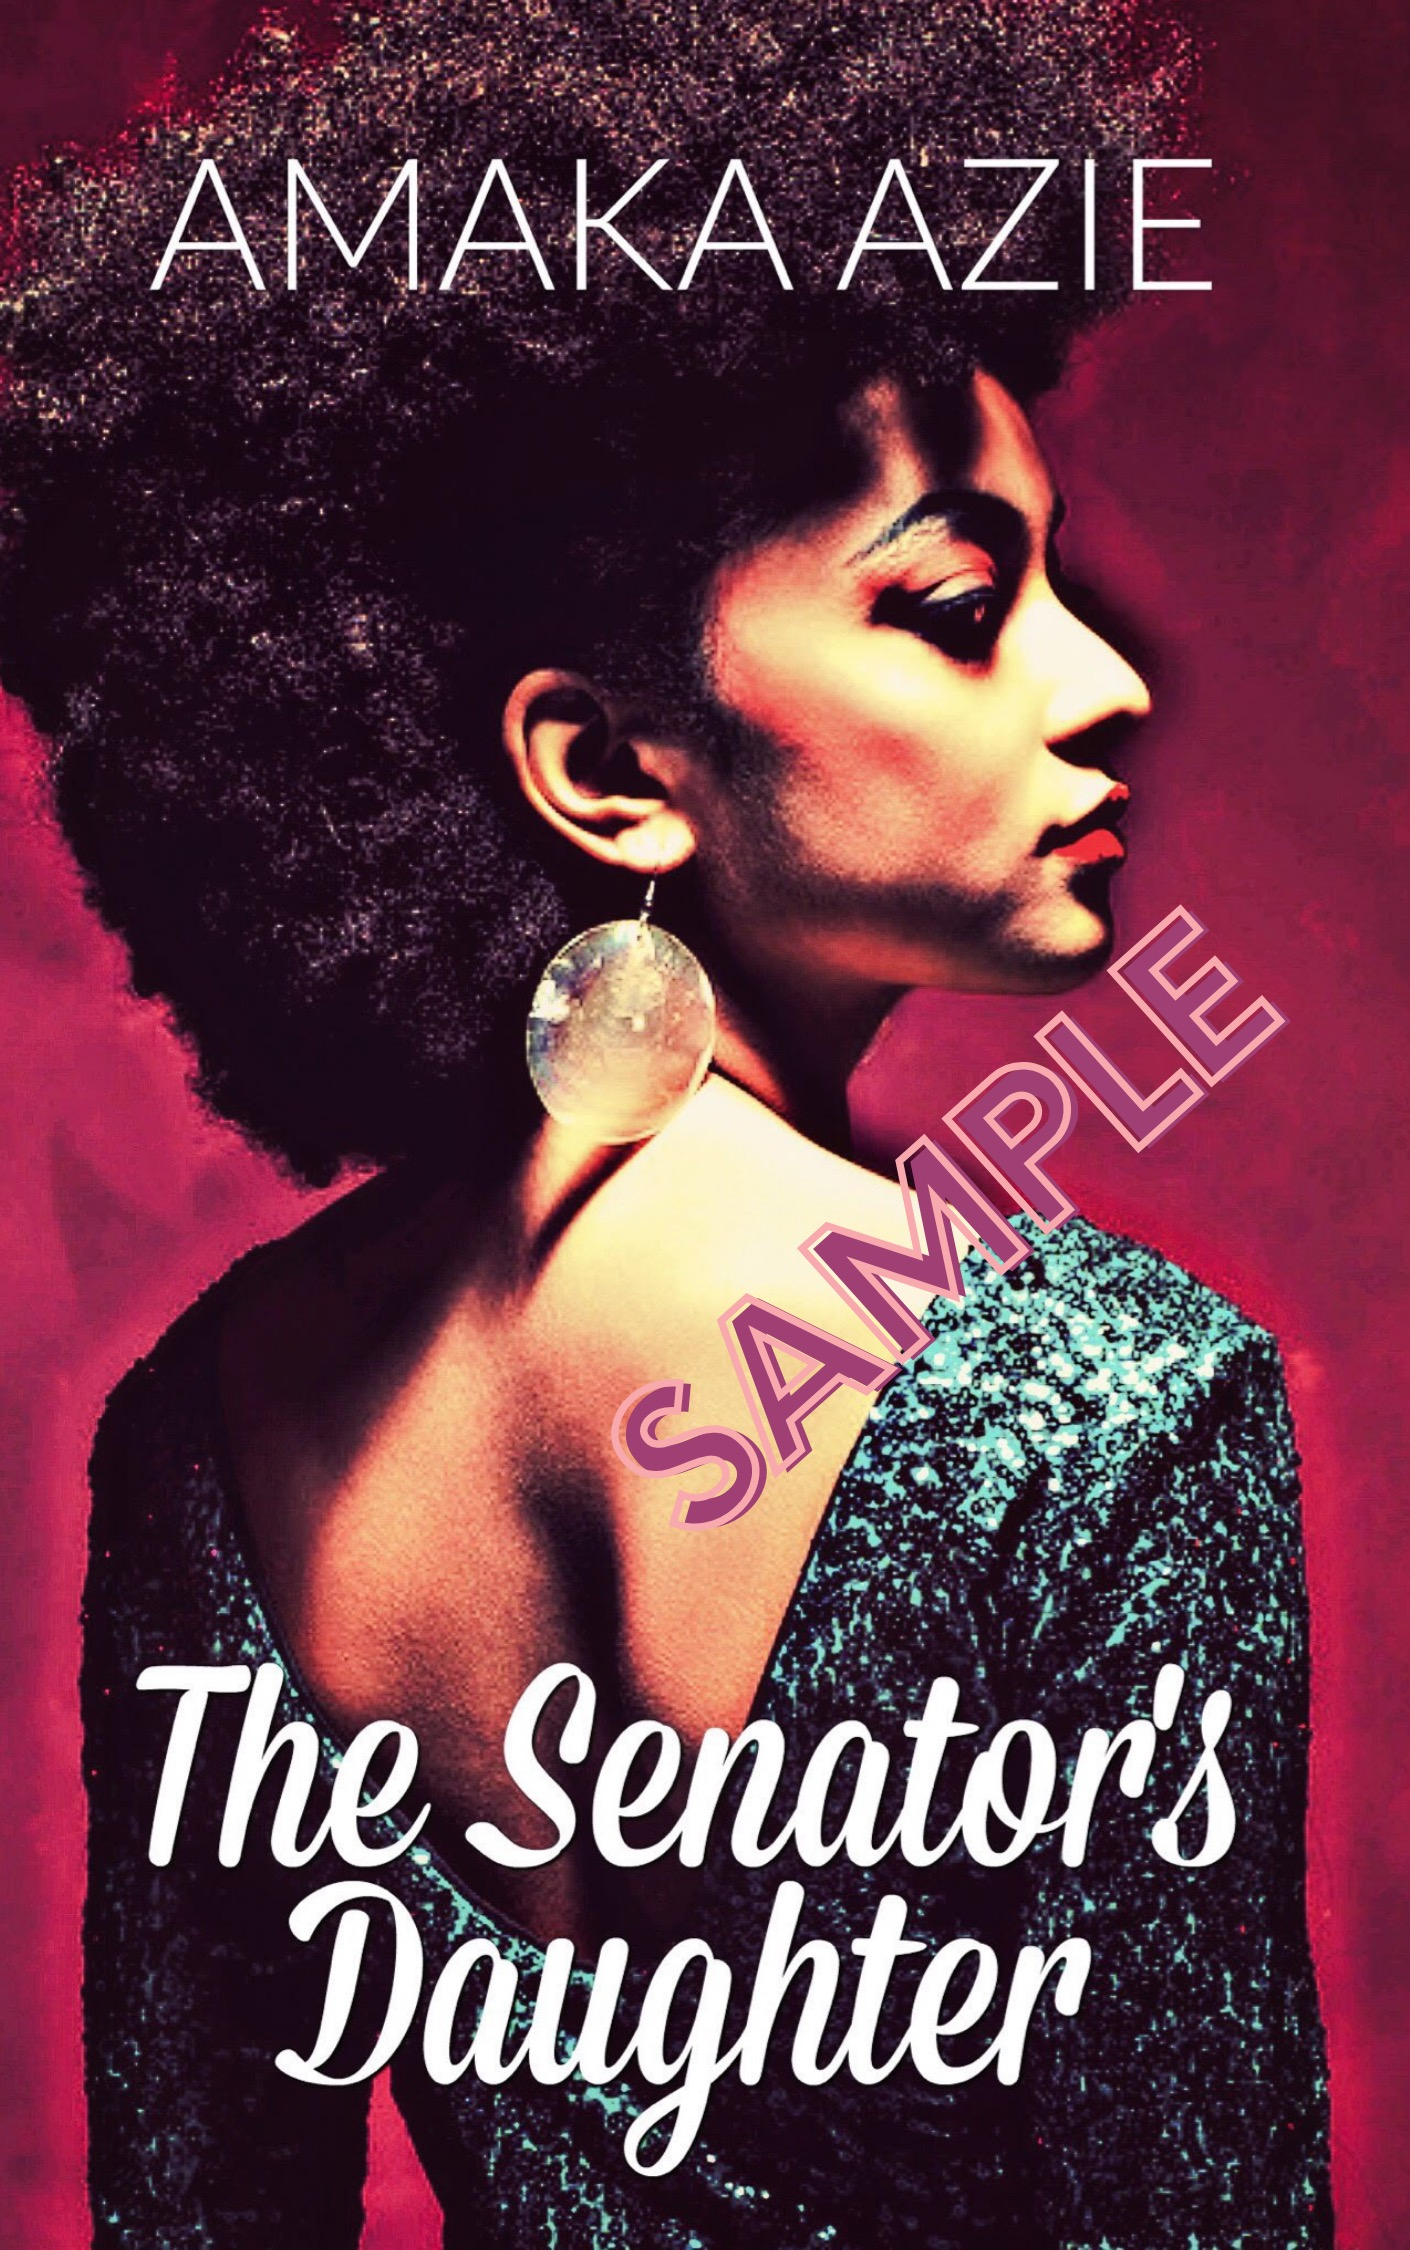 The Senator's Daughter (Preview)